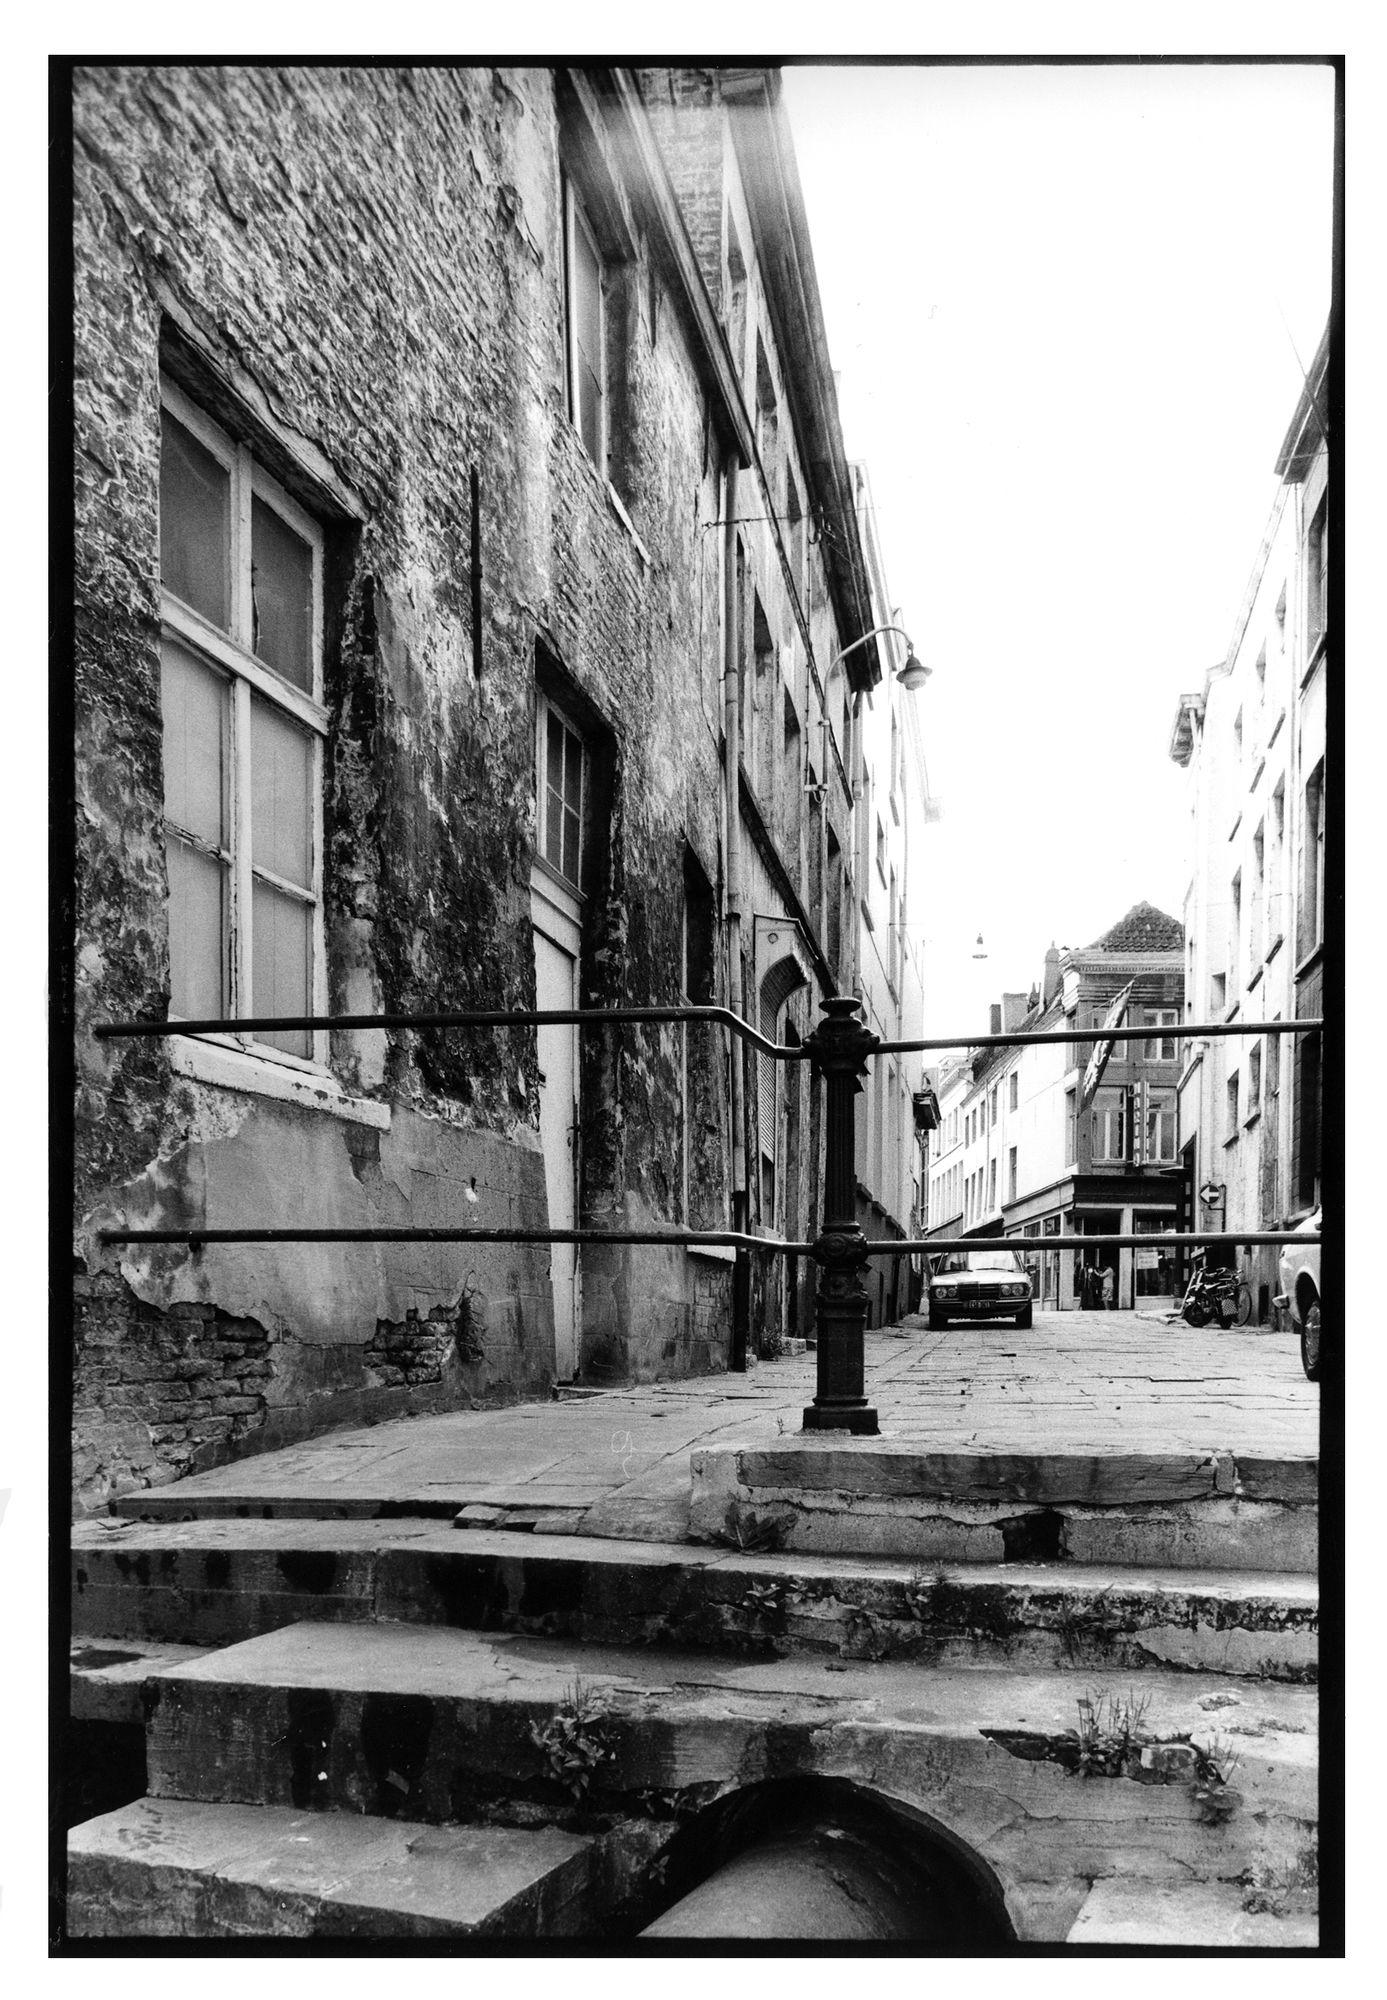 Hoefslagstraatje07_1979.jpg